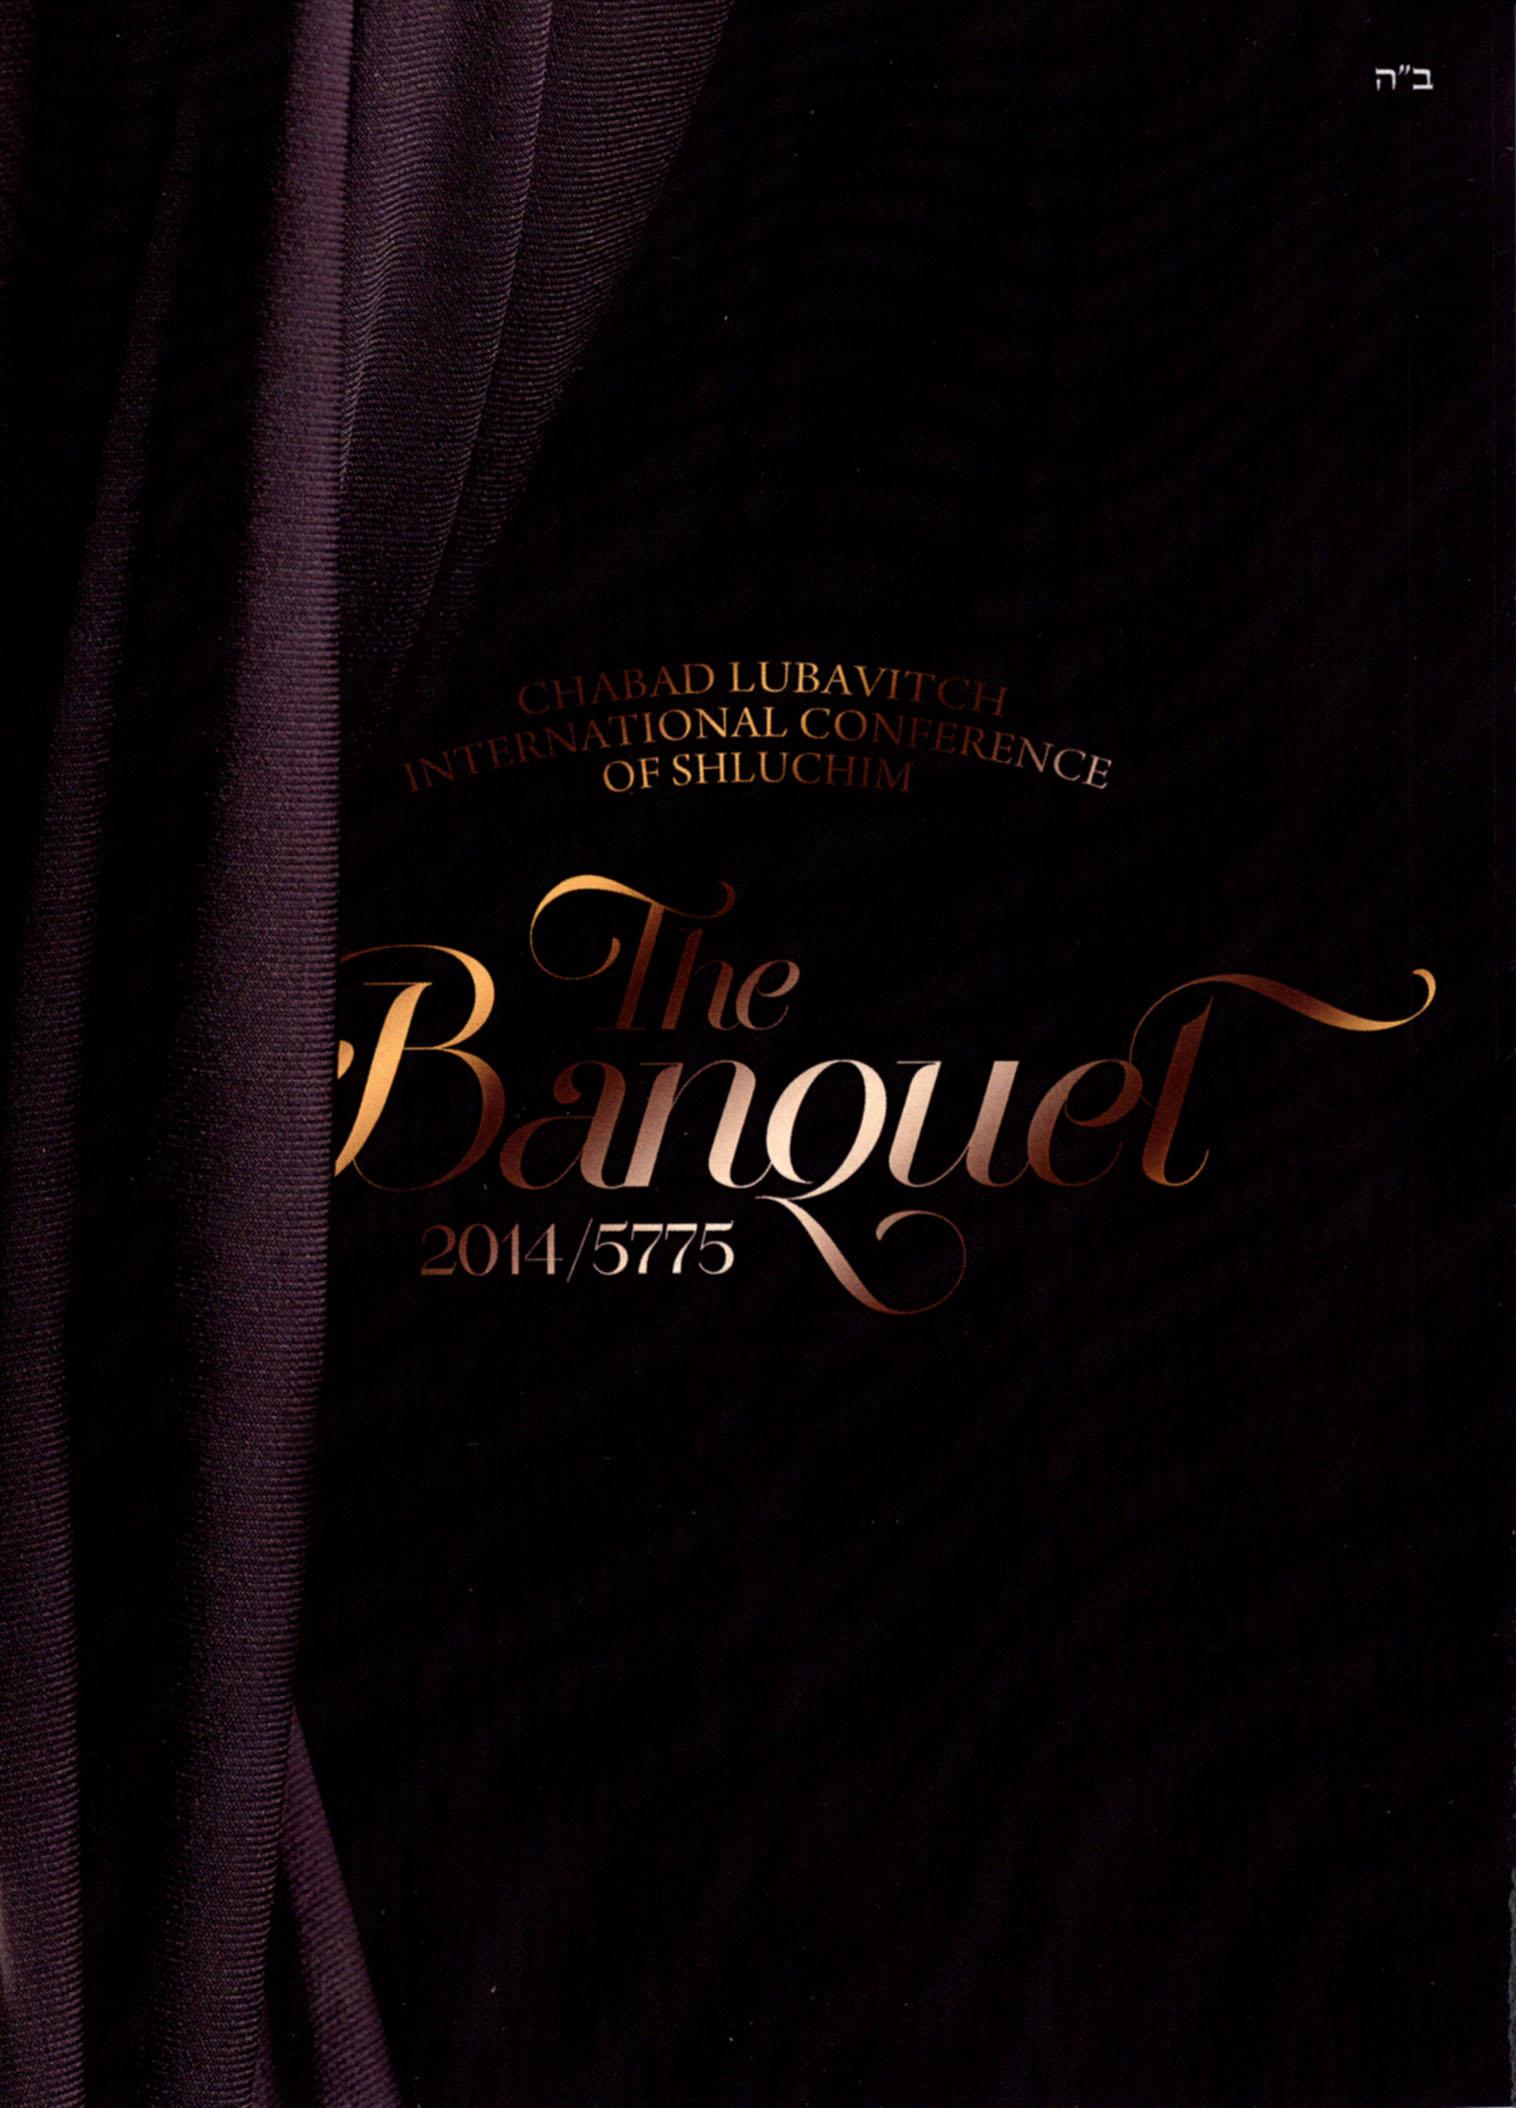 The Banquet: 2014/5775